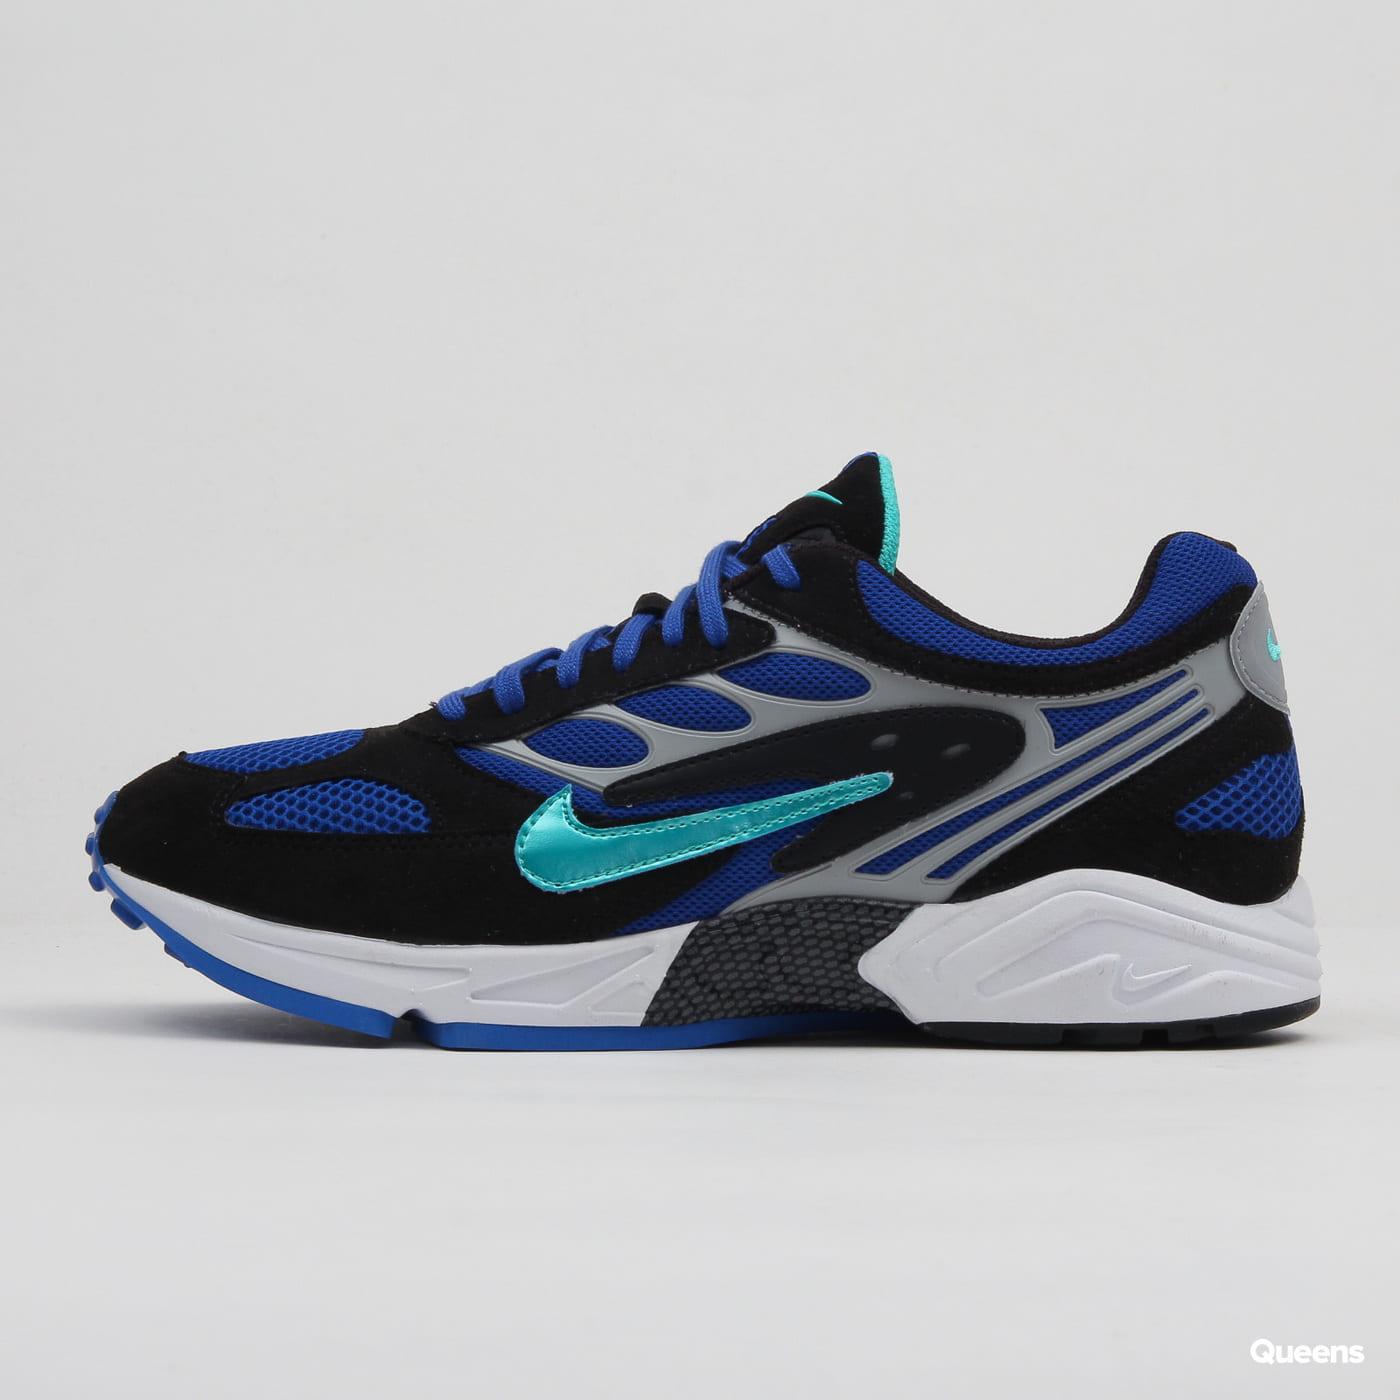 Nike Air Ghost Racer black / hyper jade - racer blue